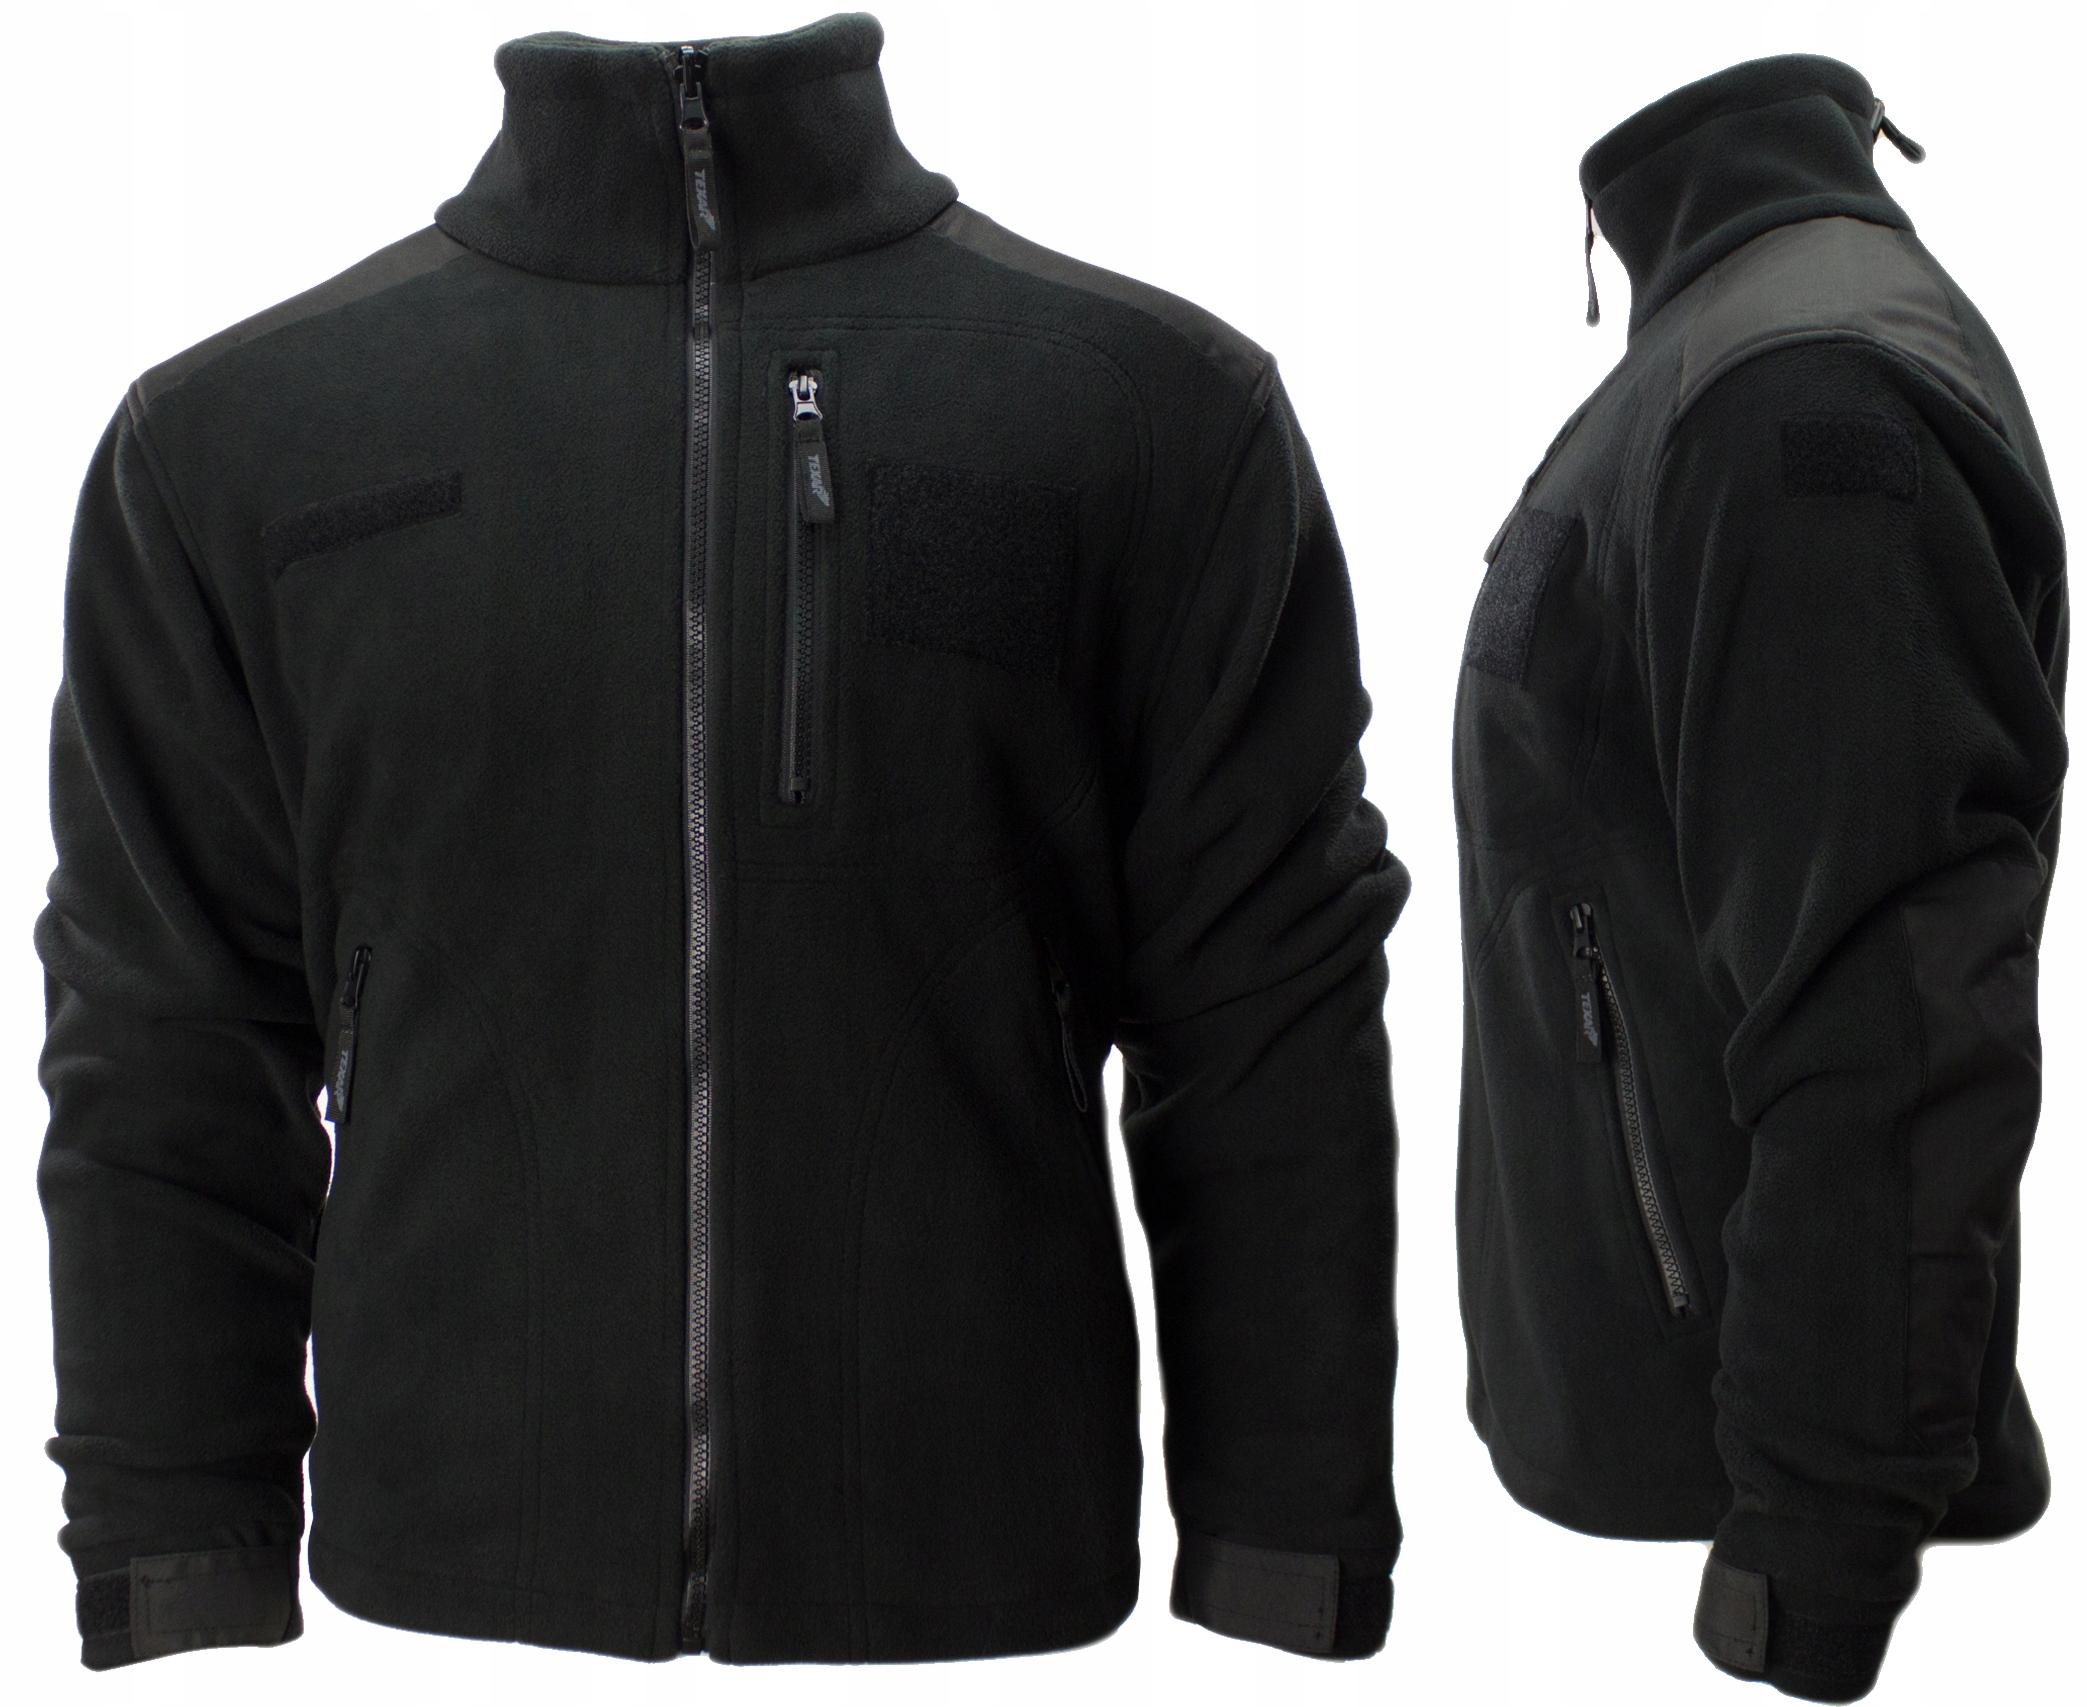 Fleece mikina Cestovné Texar 305 g fleece bunda ECWCS XL Čierna